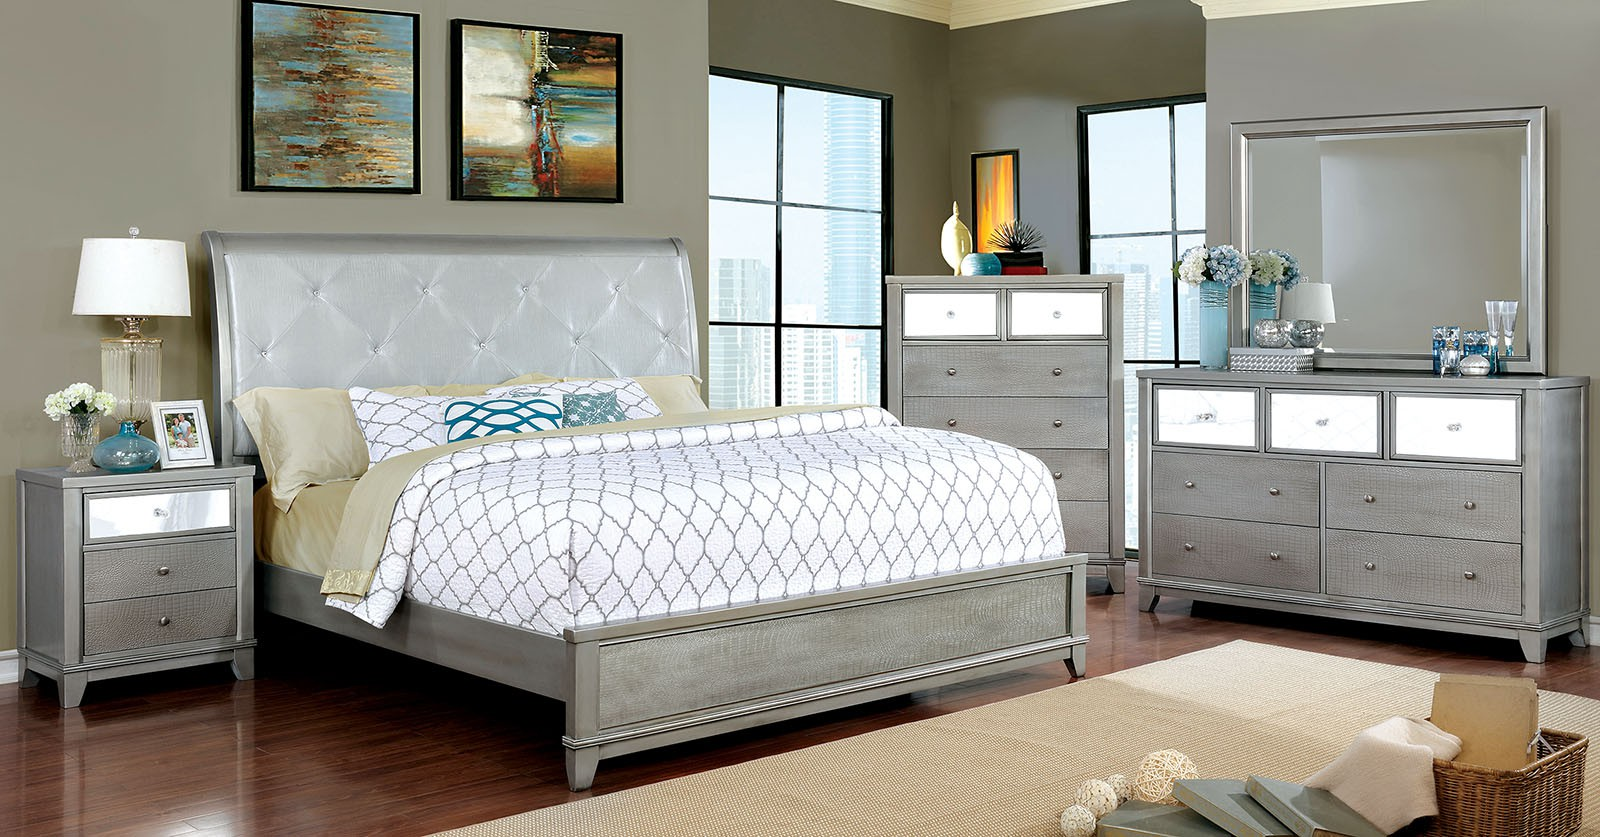 Bedroom Furniture Queen Size Bed Dresser Mirror Nightstand Silver Classic 4pc Set